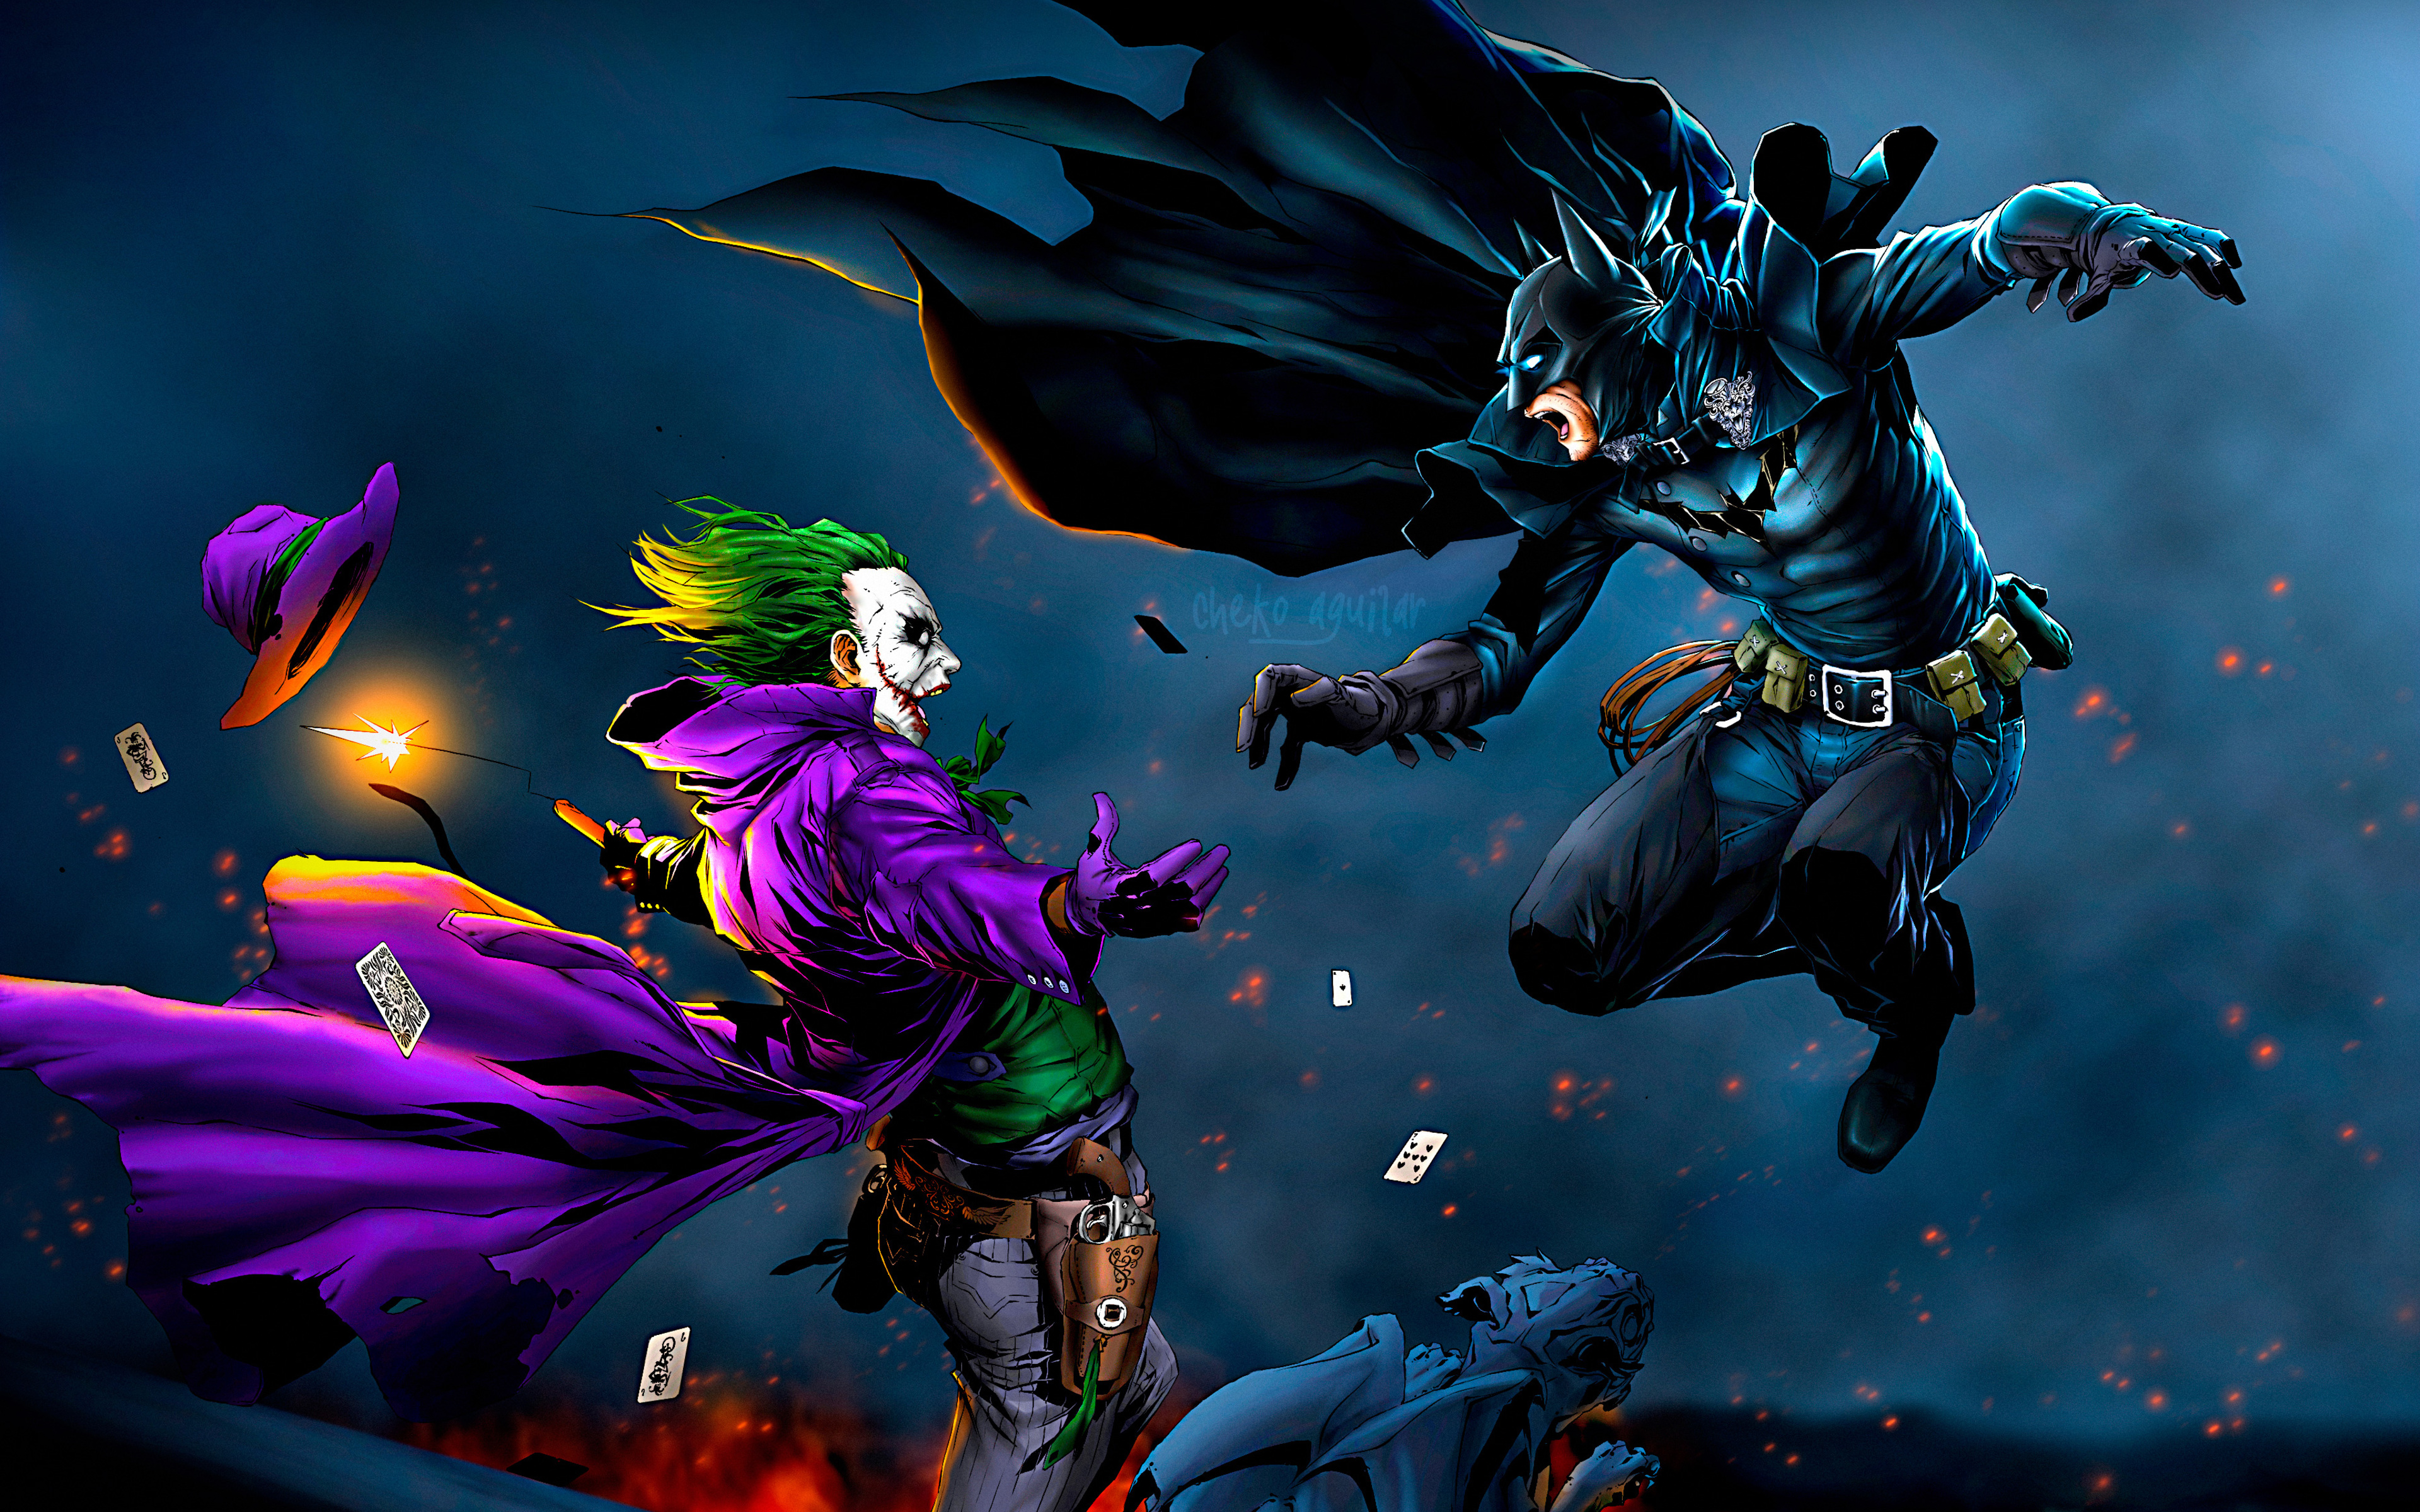 3840x2400 Batman Vs Joker 4k Hd 4k Wallpapers Images